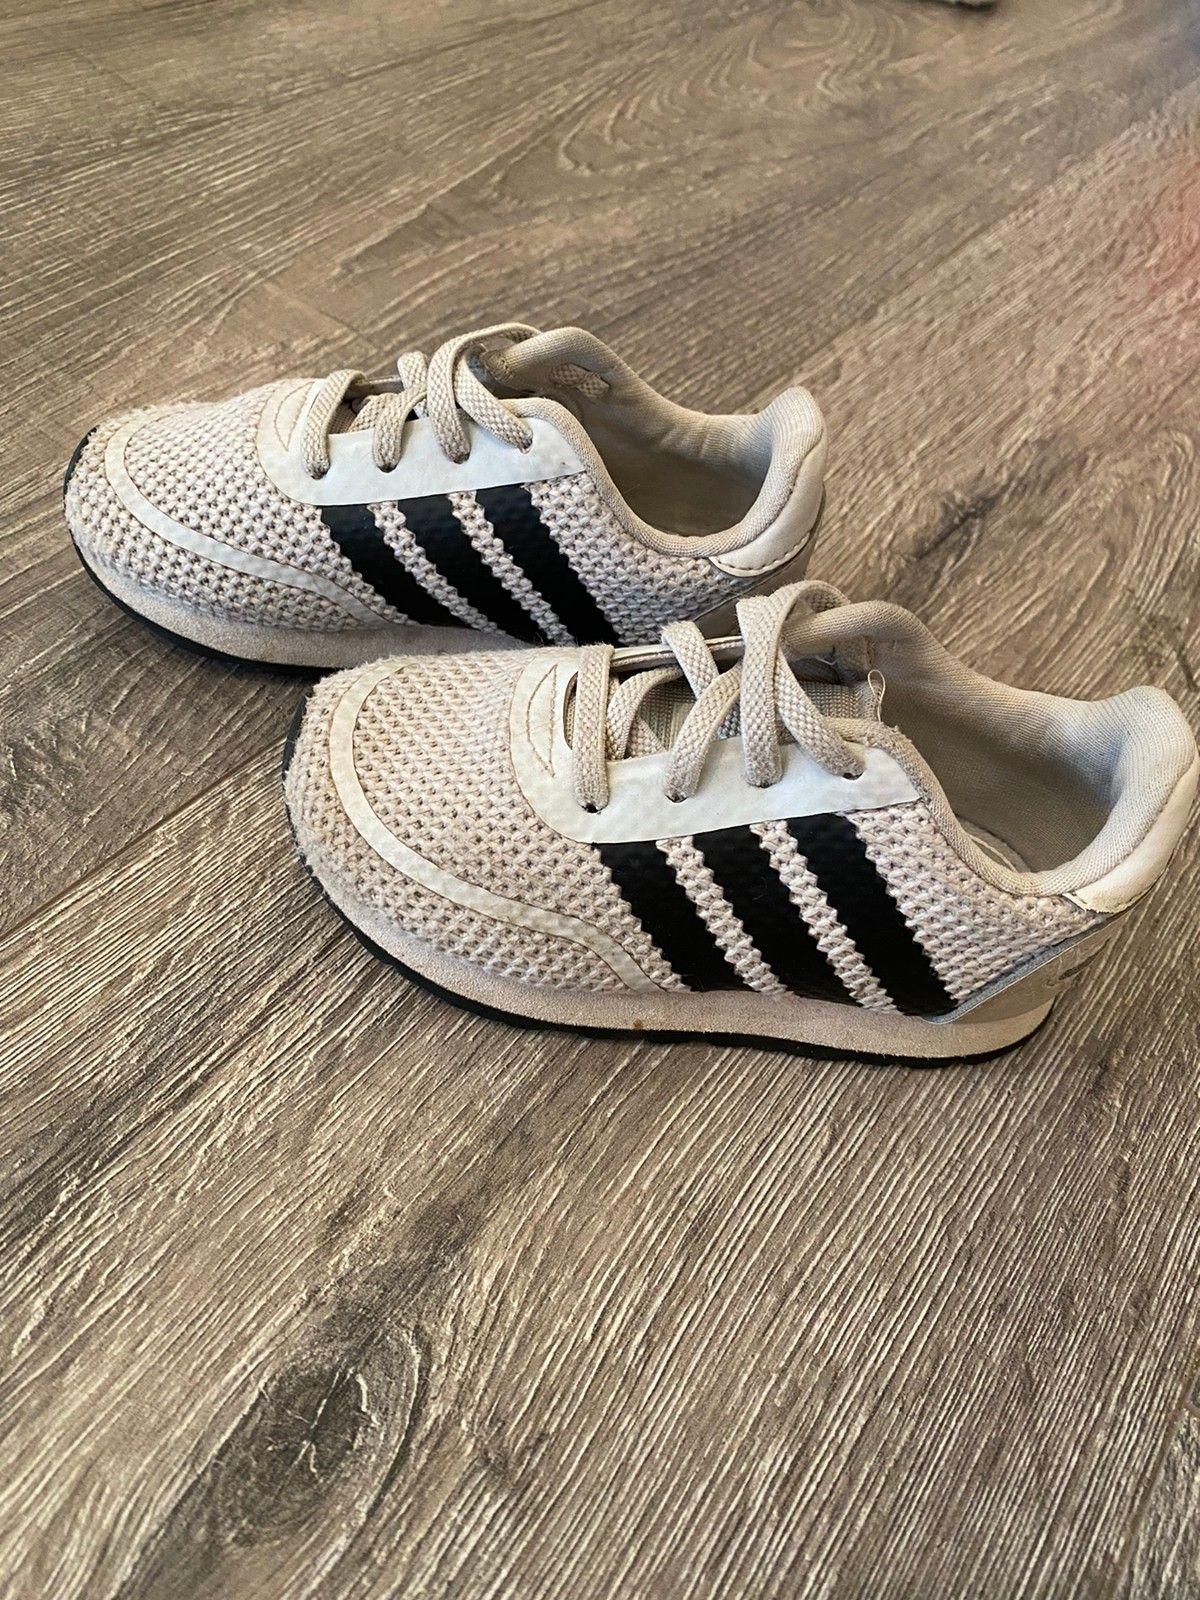 Adidas sko str 22 | FINN.no